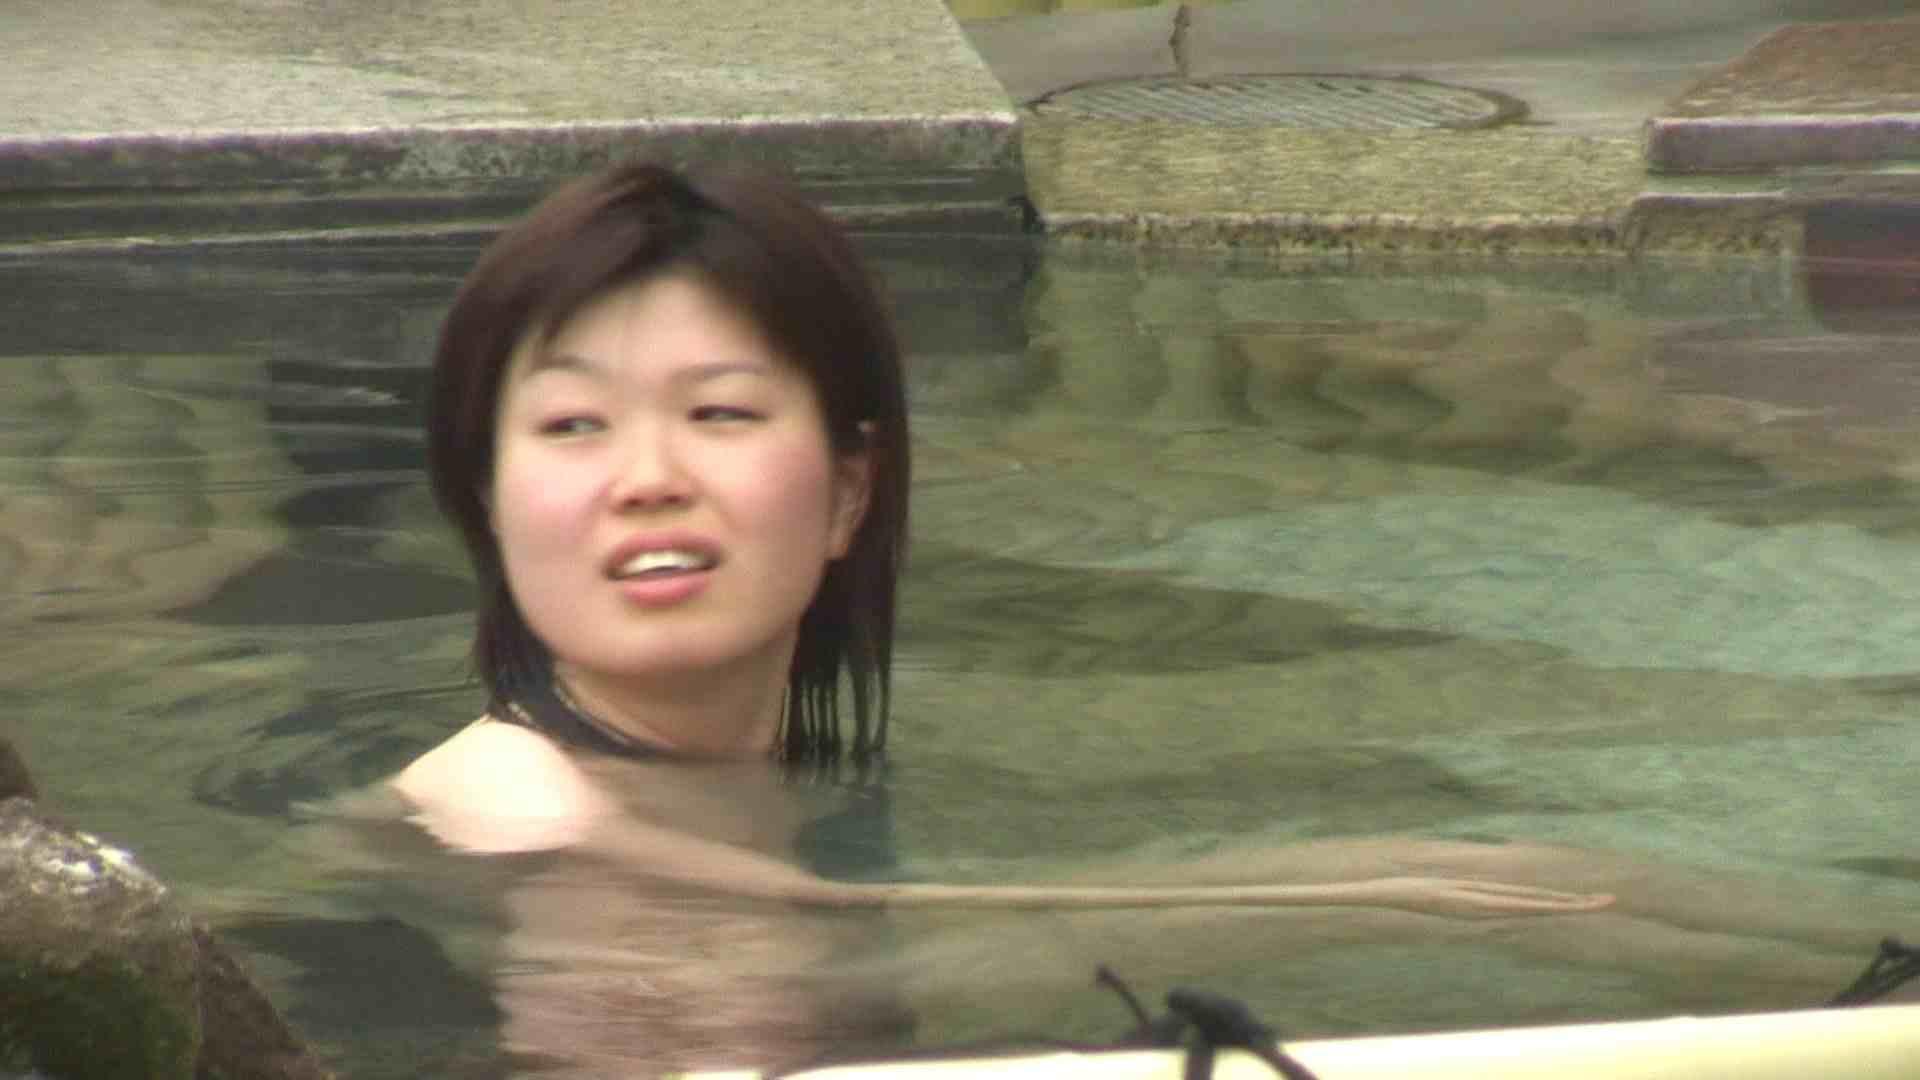 Aquaな露天風呂Vol.675 露天 オマンコ動画キャプチャ 77画像 29